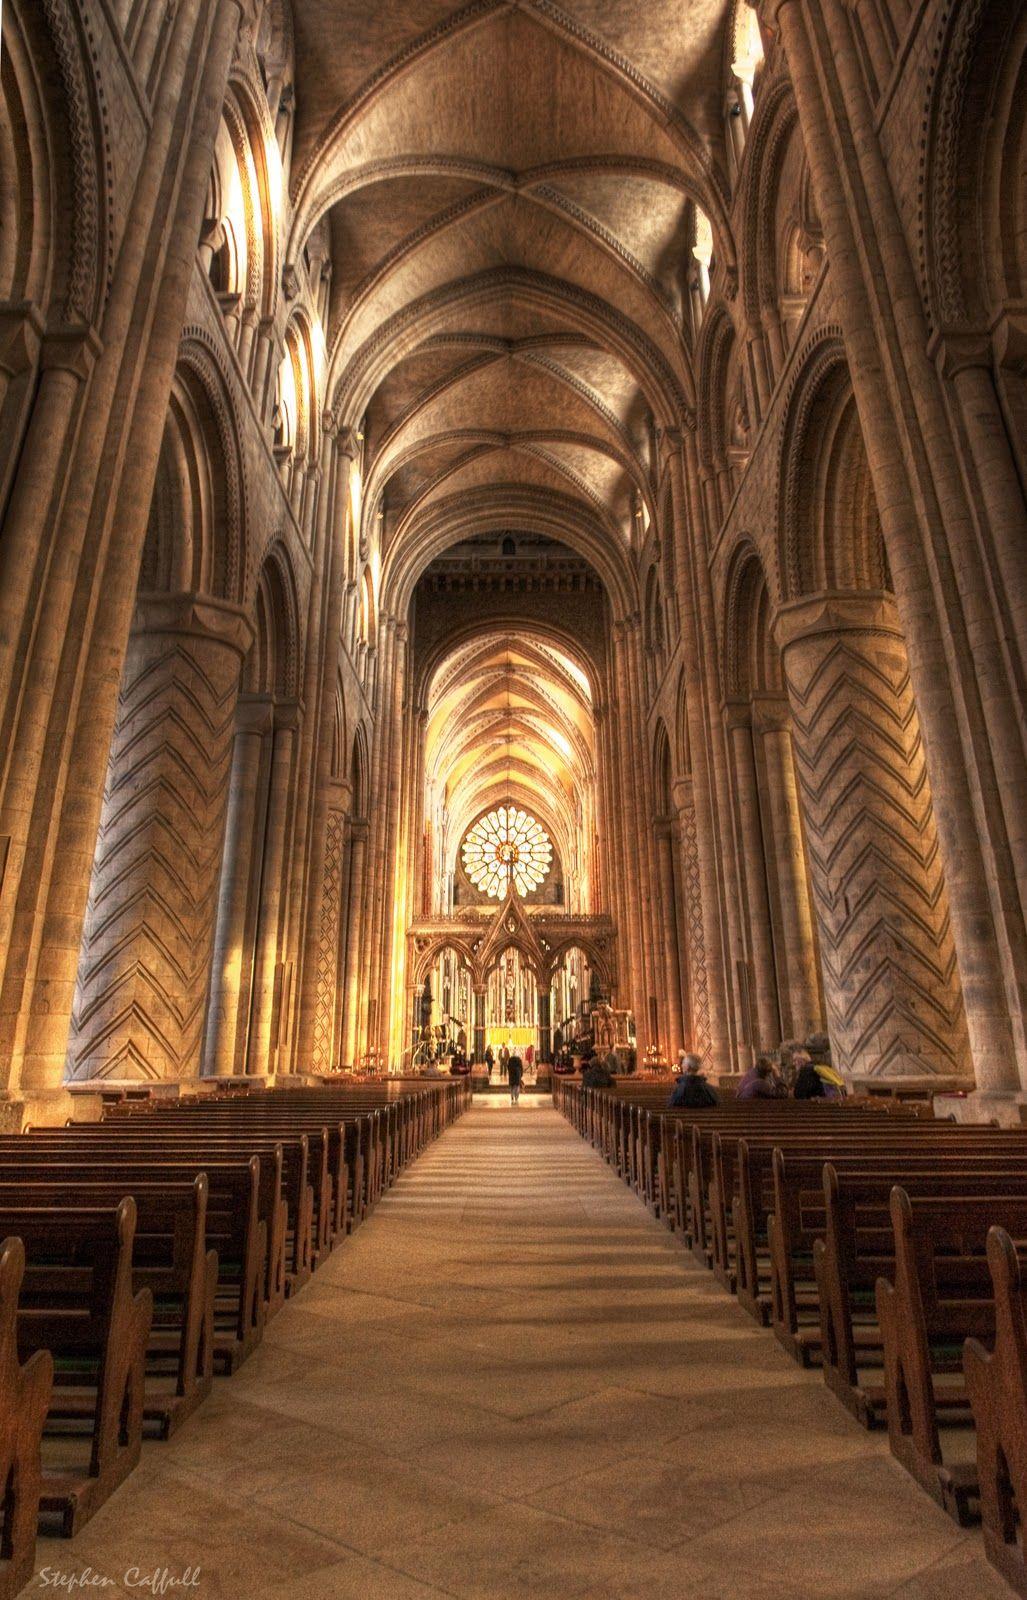 Interior de la catedral de durham en inglaterra london - Catedral de sevilla interior ...